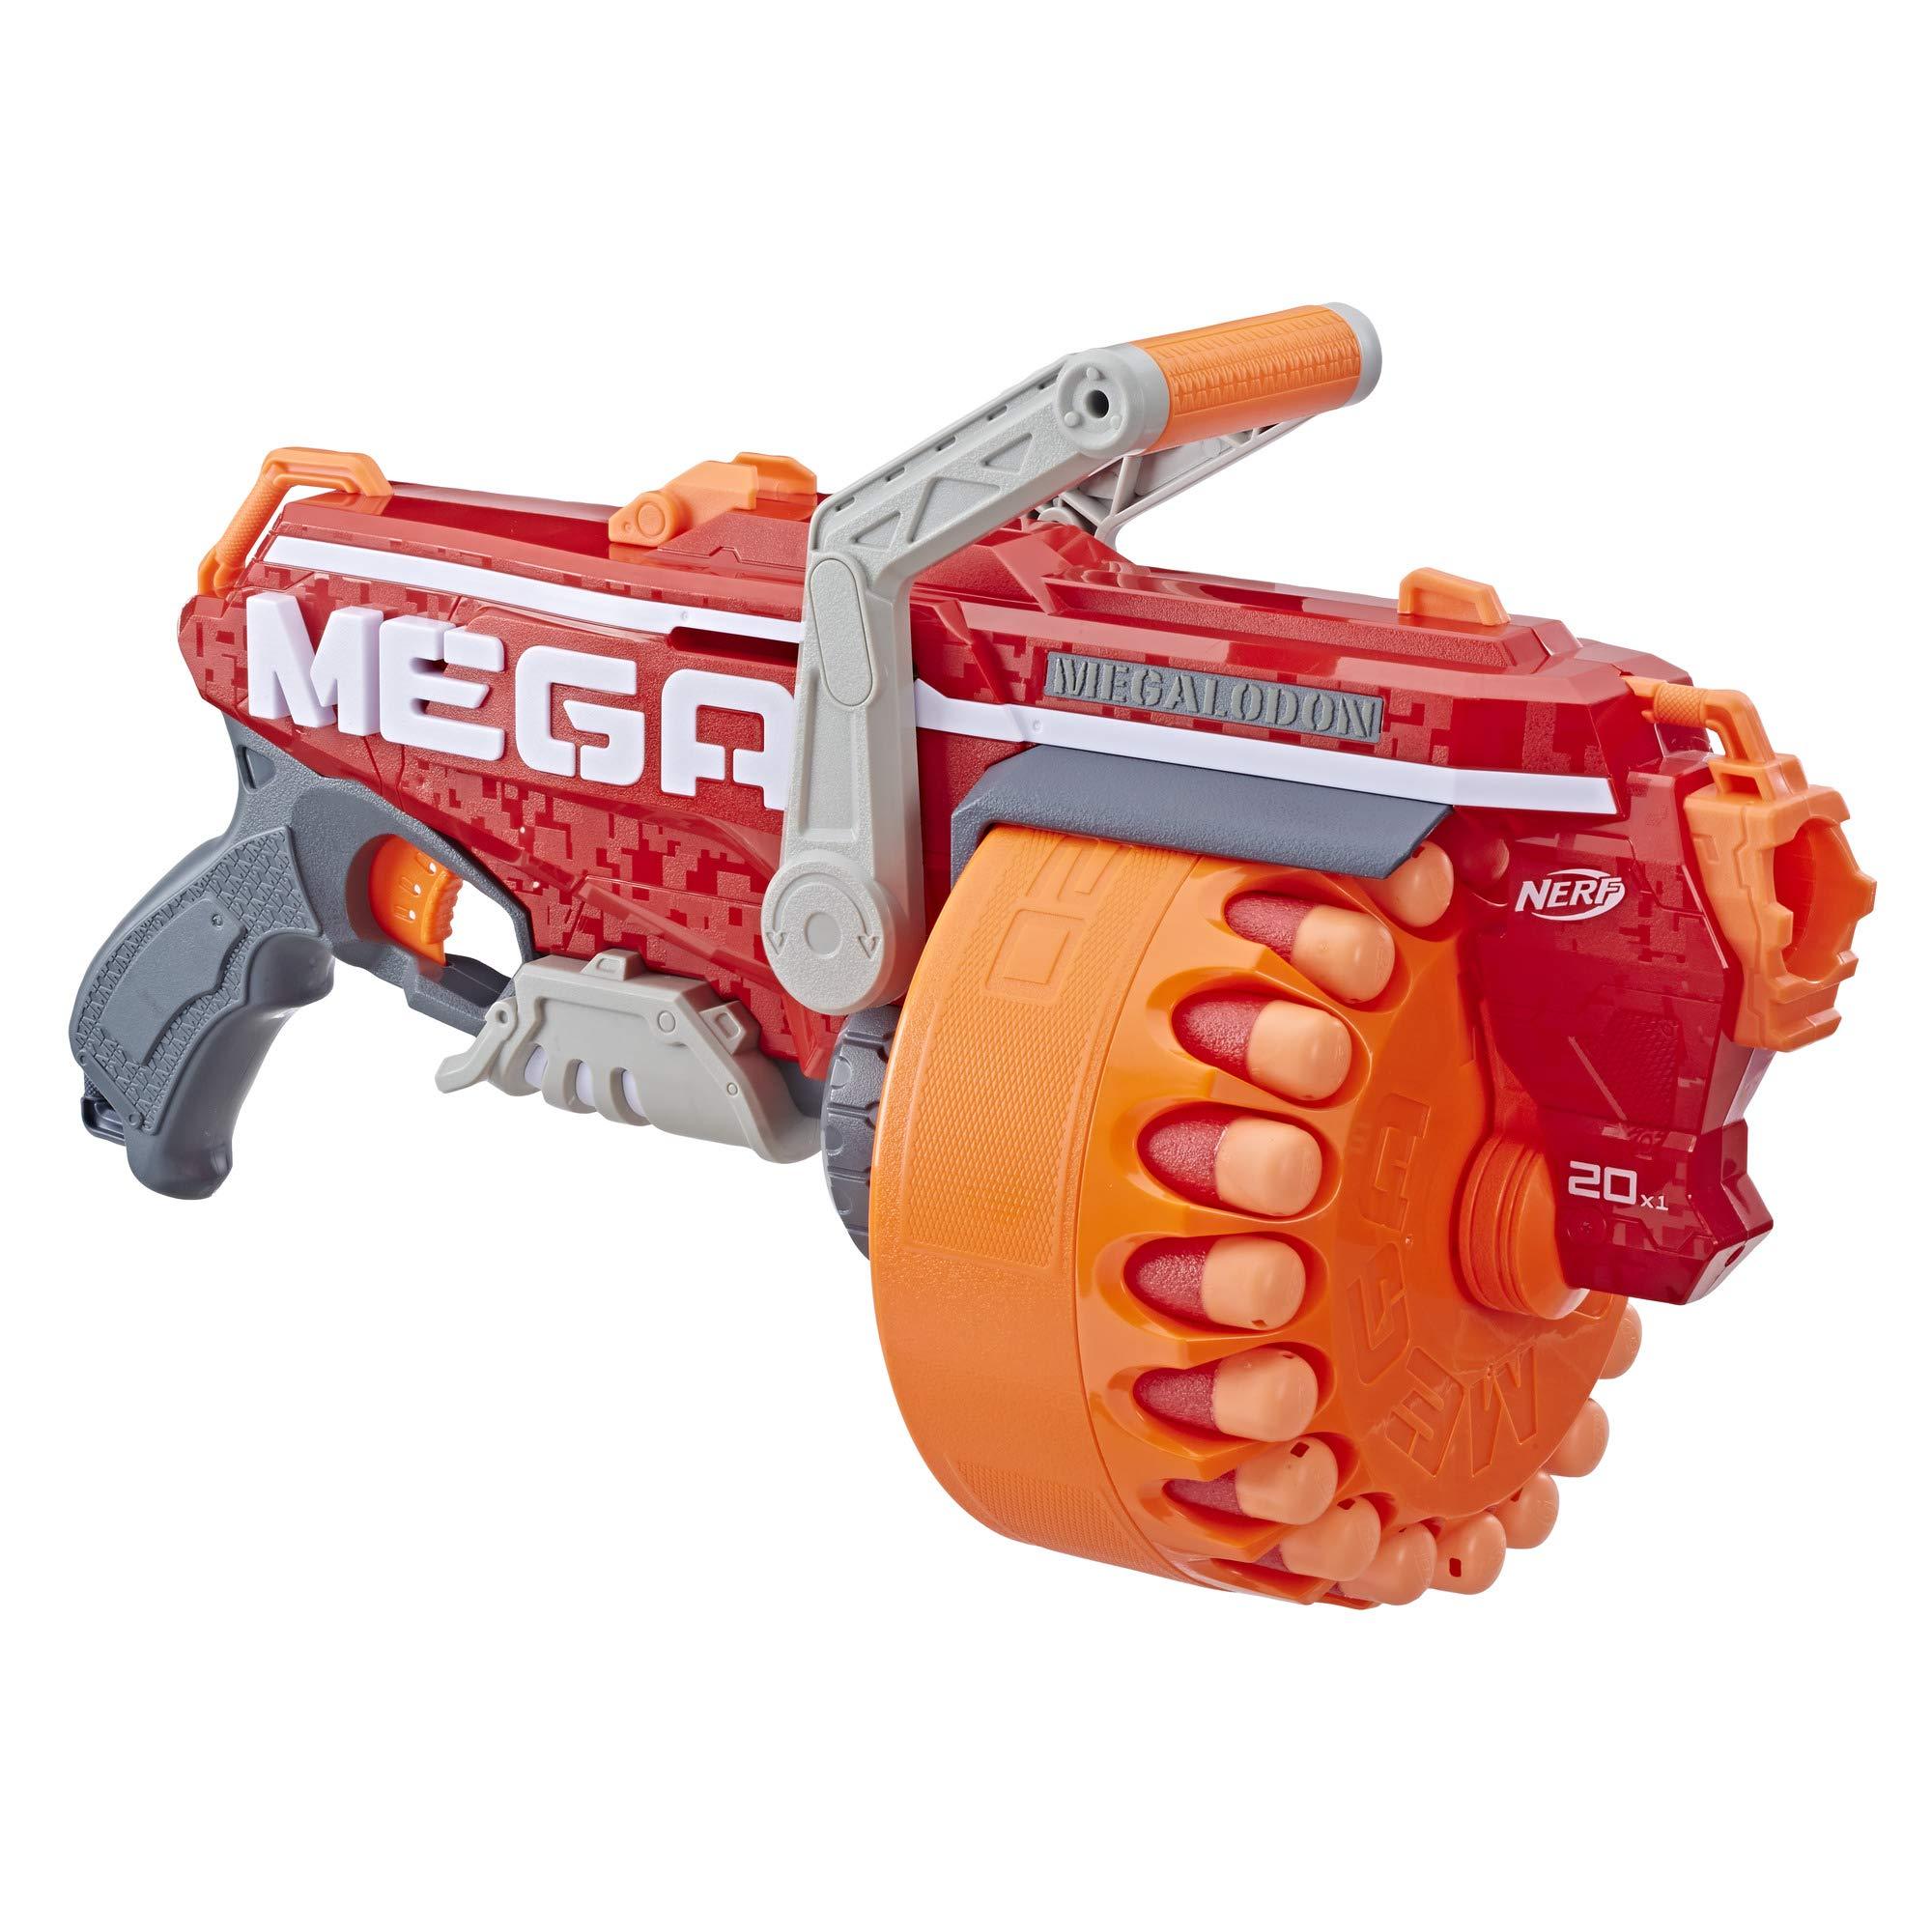 NERF Megalodon N-Strike Mega Toy Blaster with 20 Official Mega Whistler Darts Includes: Blaster, Drum, 20 Darts, & Instructions by NERF